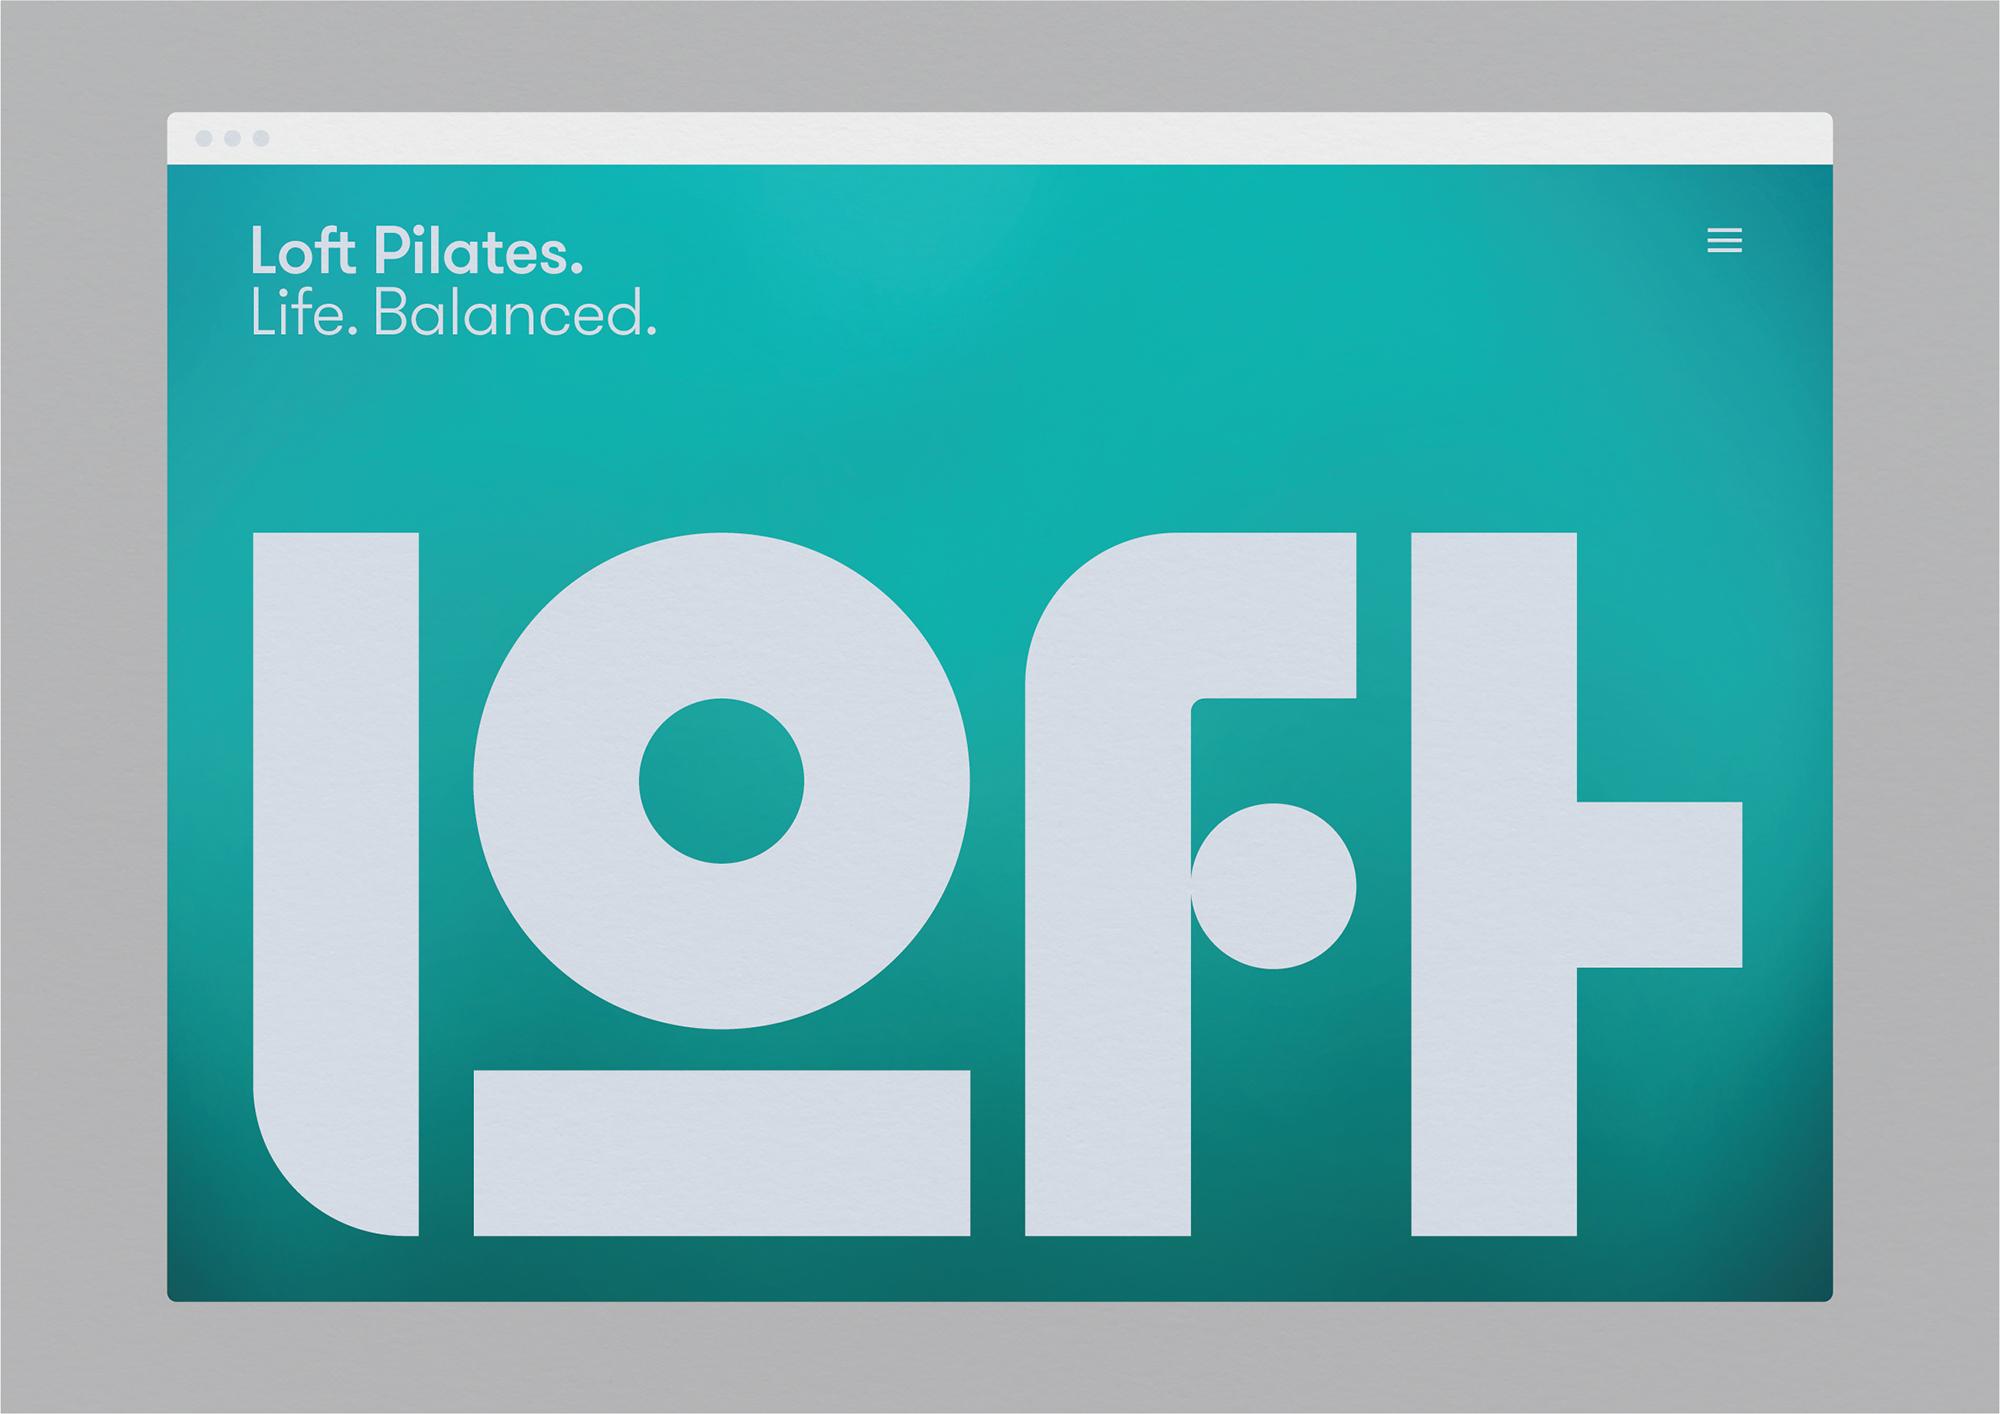 Loft Pilates CS 19-11.jpg